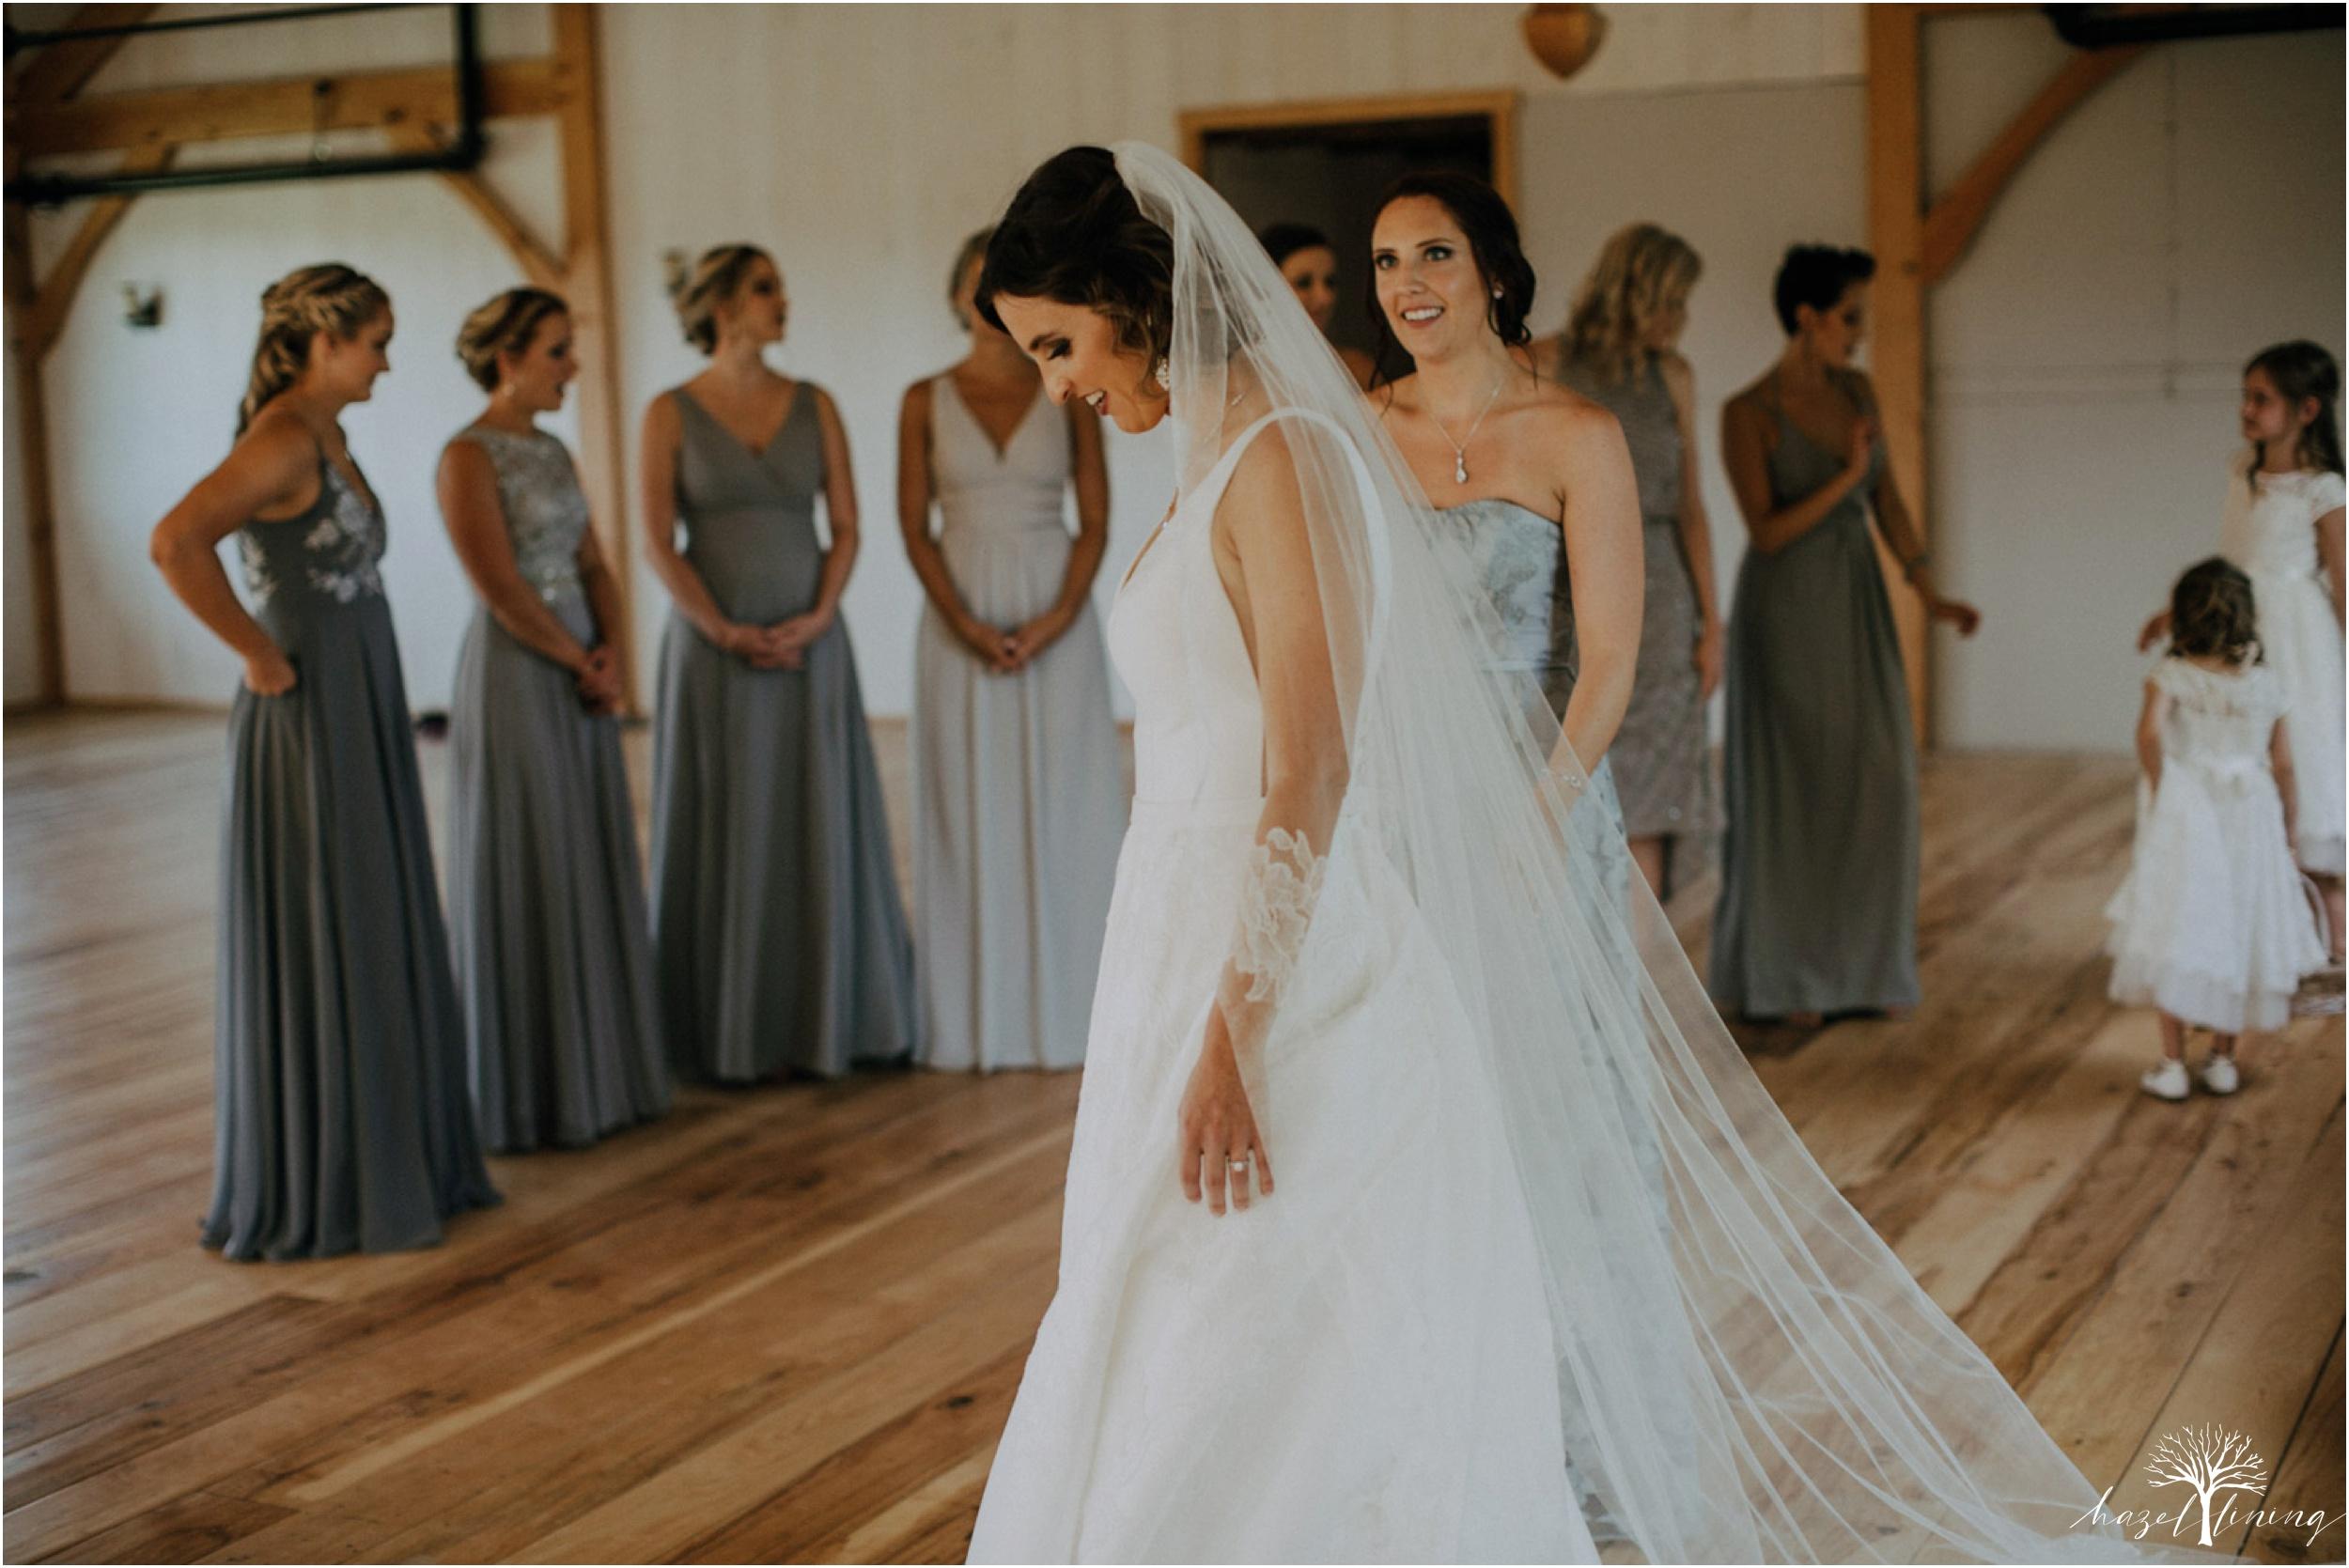 maureen-hepner-anthony-giordano-rose-bank-winery-newtow-pennsylvania-luxury-summer-wedding-hazel-lining-photography-destination-elopement-wedding-engagement-photography_0022.jpg